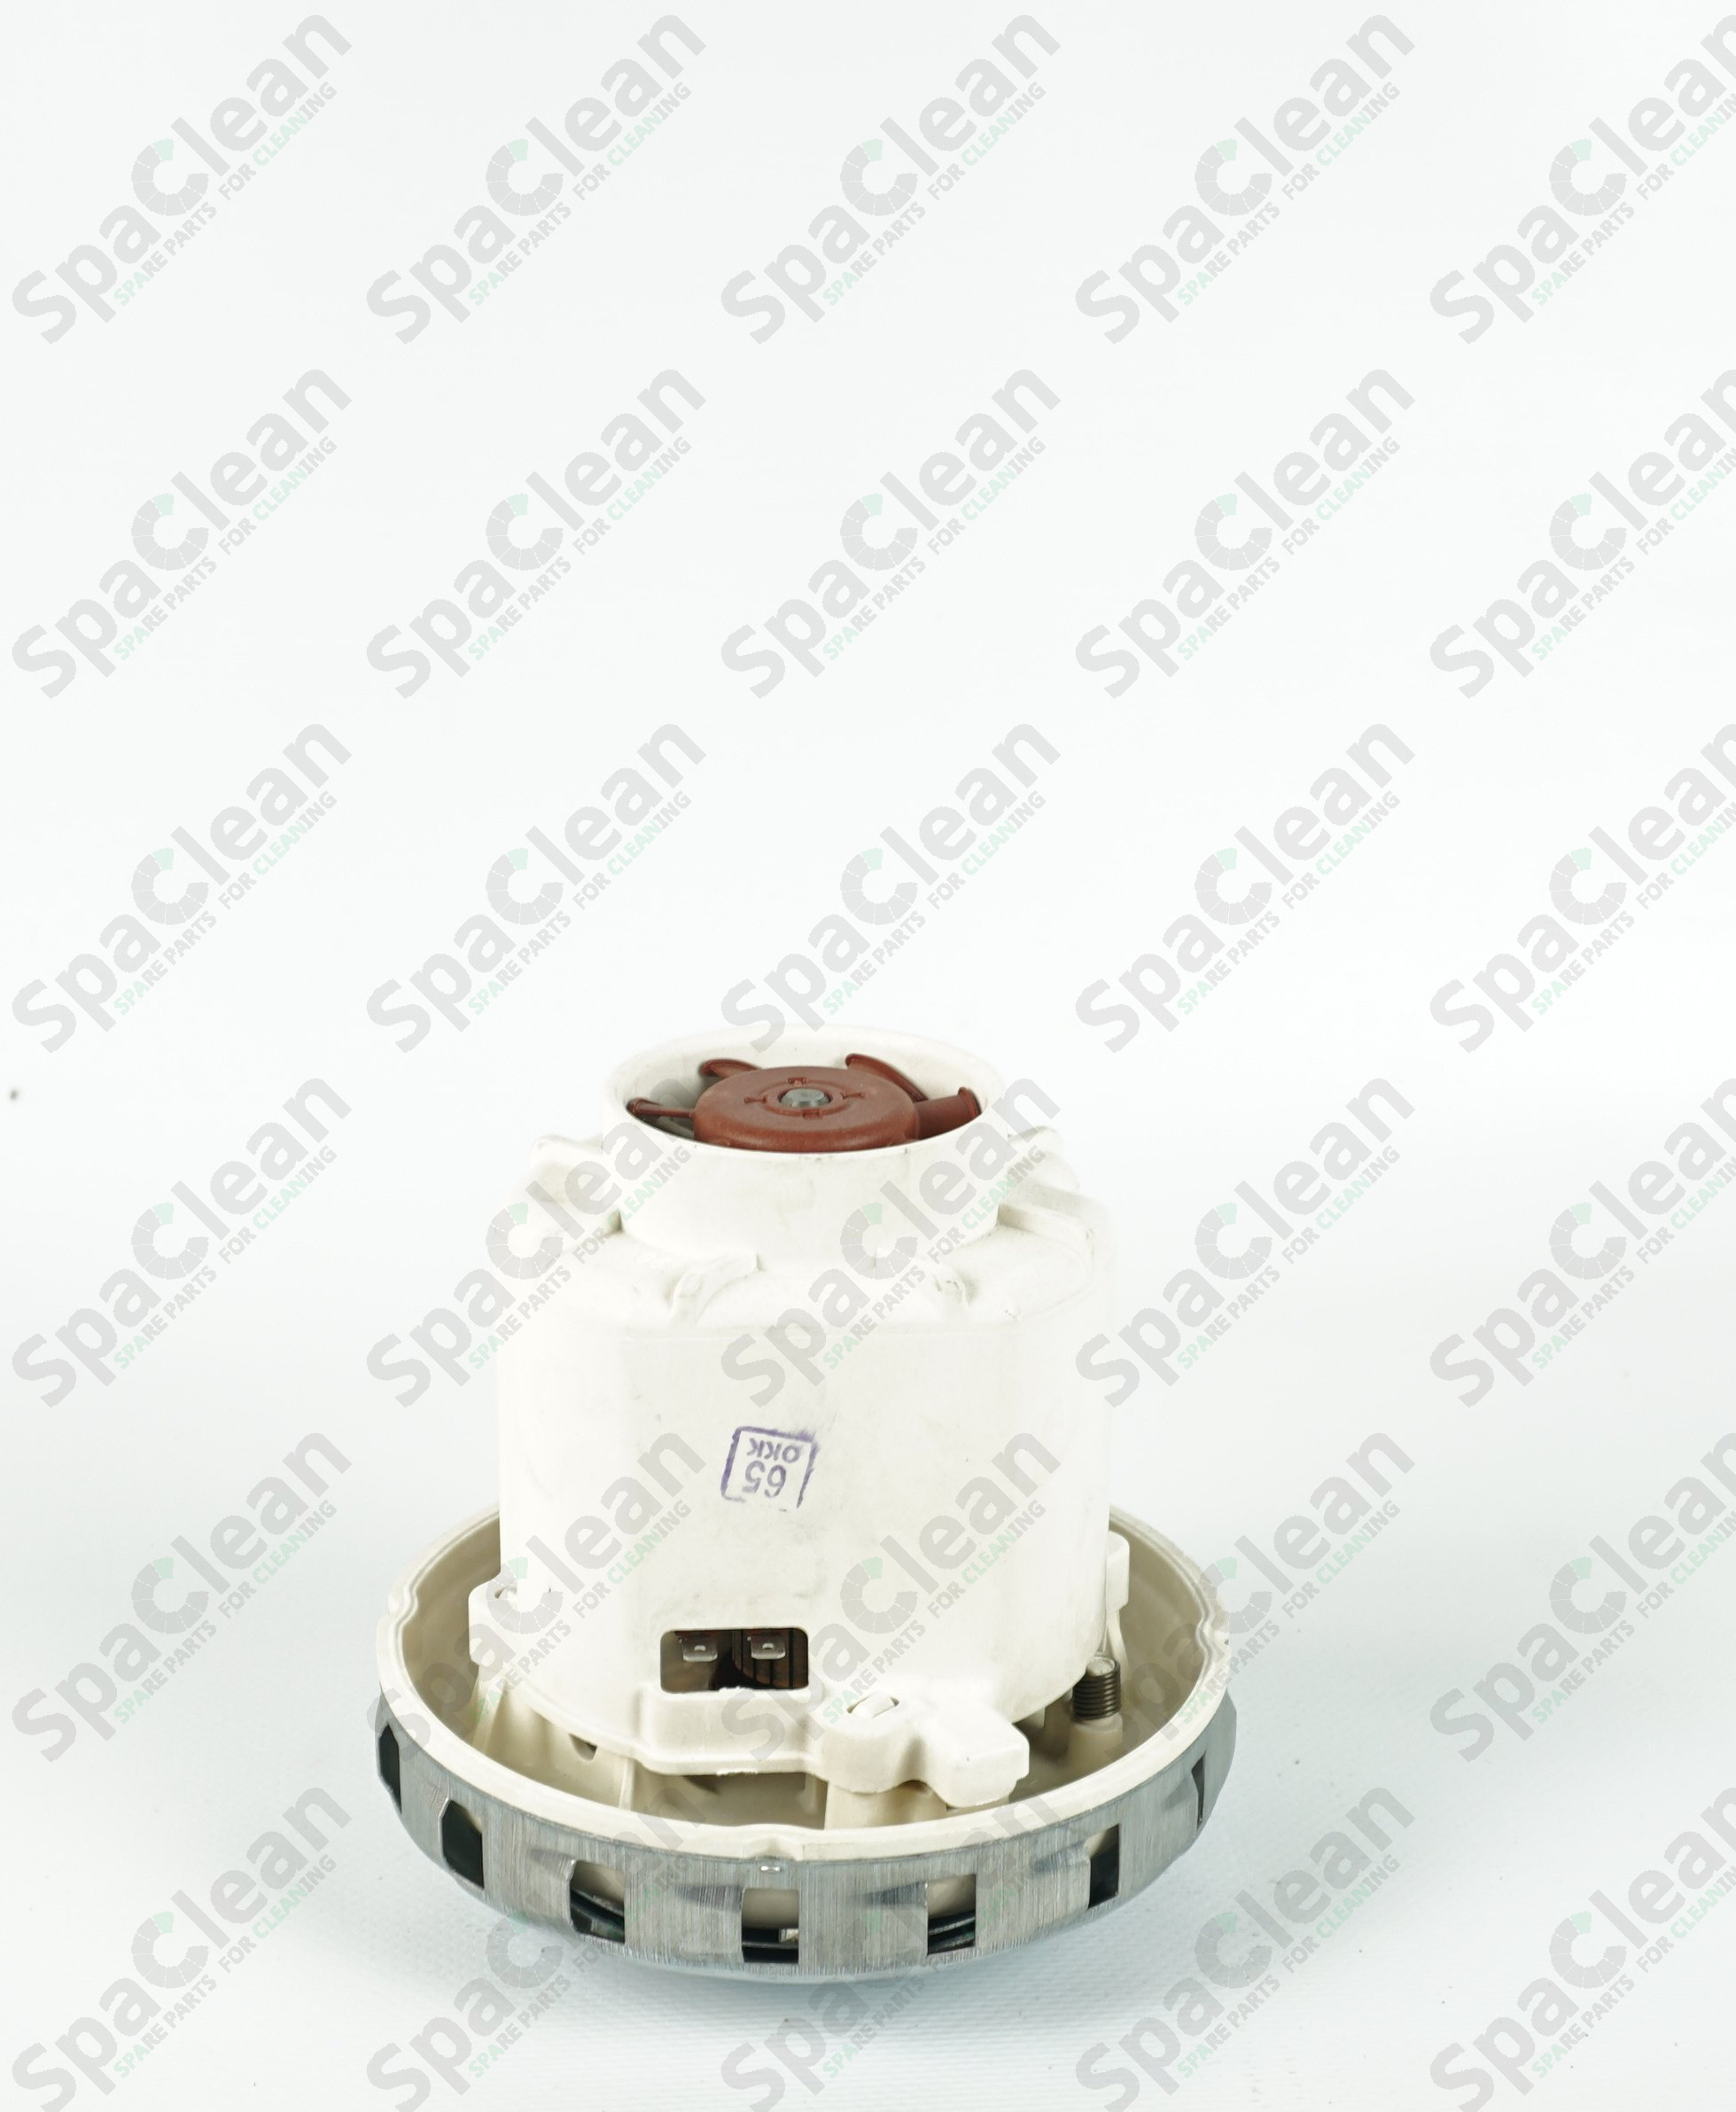 Вакуумный мотор 230V 1100W Одностадийный для Wirbel POWER WD 80.2 P 230V EXP